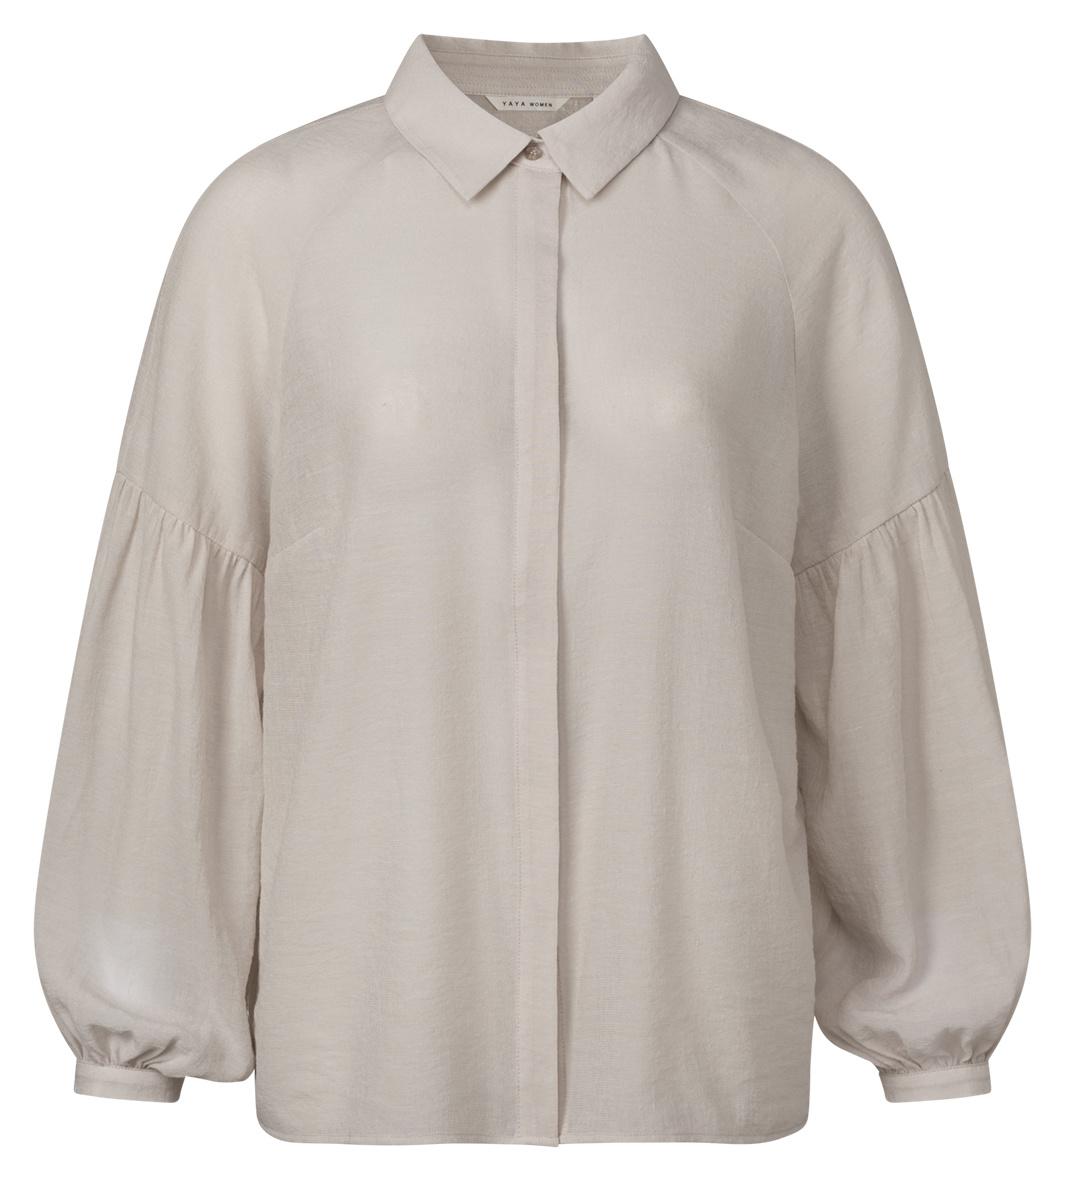 yaya Puff sleeve blouse 1101235-121-1